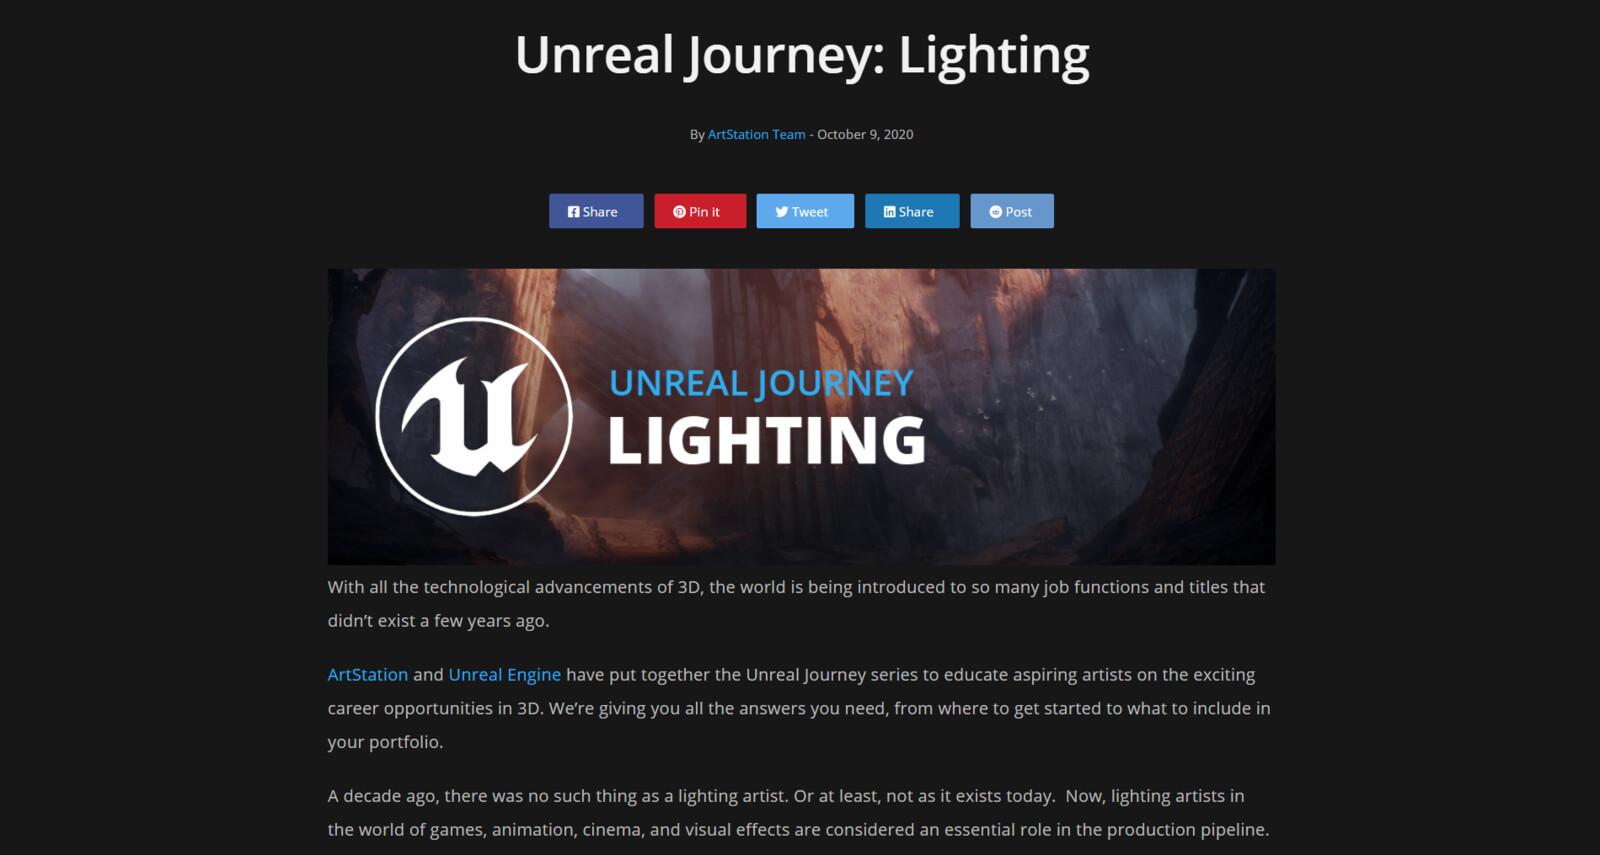 https://magazine.artstation.com/2020/10/unreal-journey-lighting/